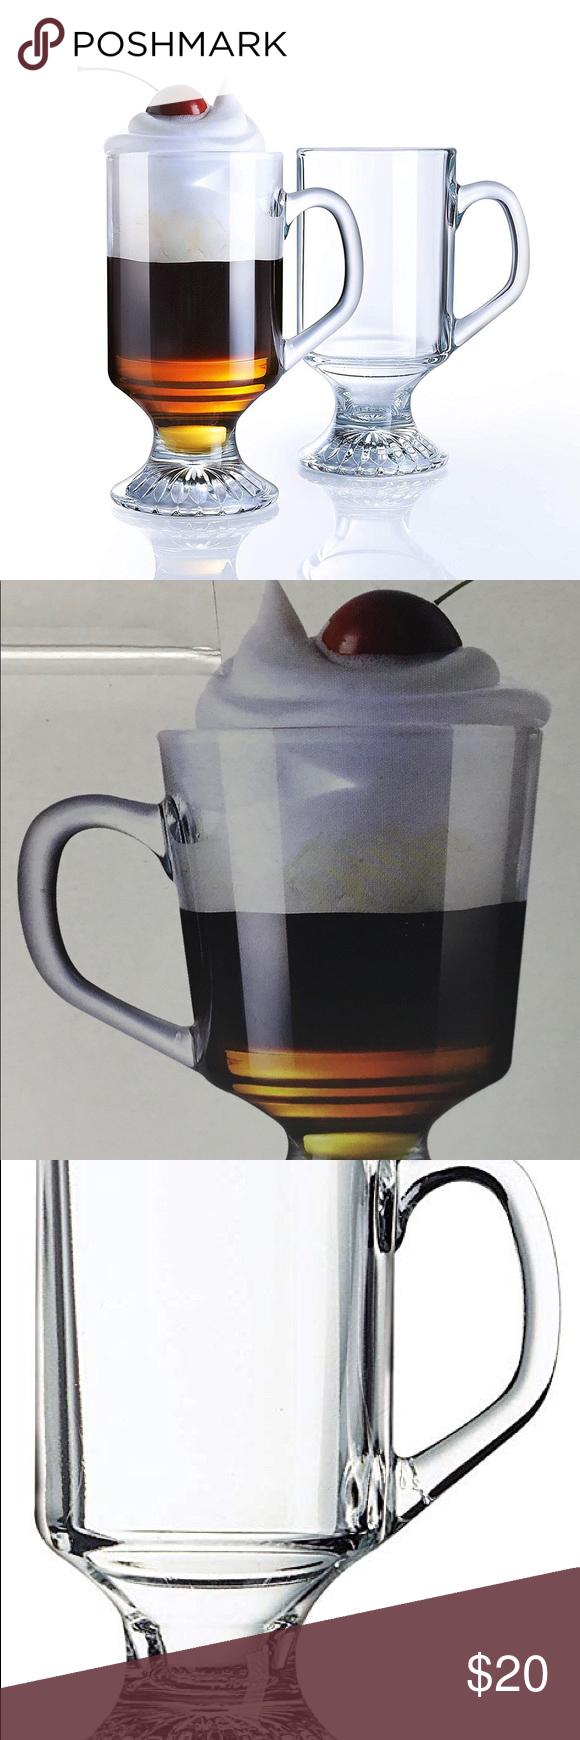 Luminarc 10 Oz. Irish Footed Coffee Mugs Set of 4 in 2020